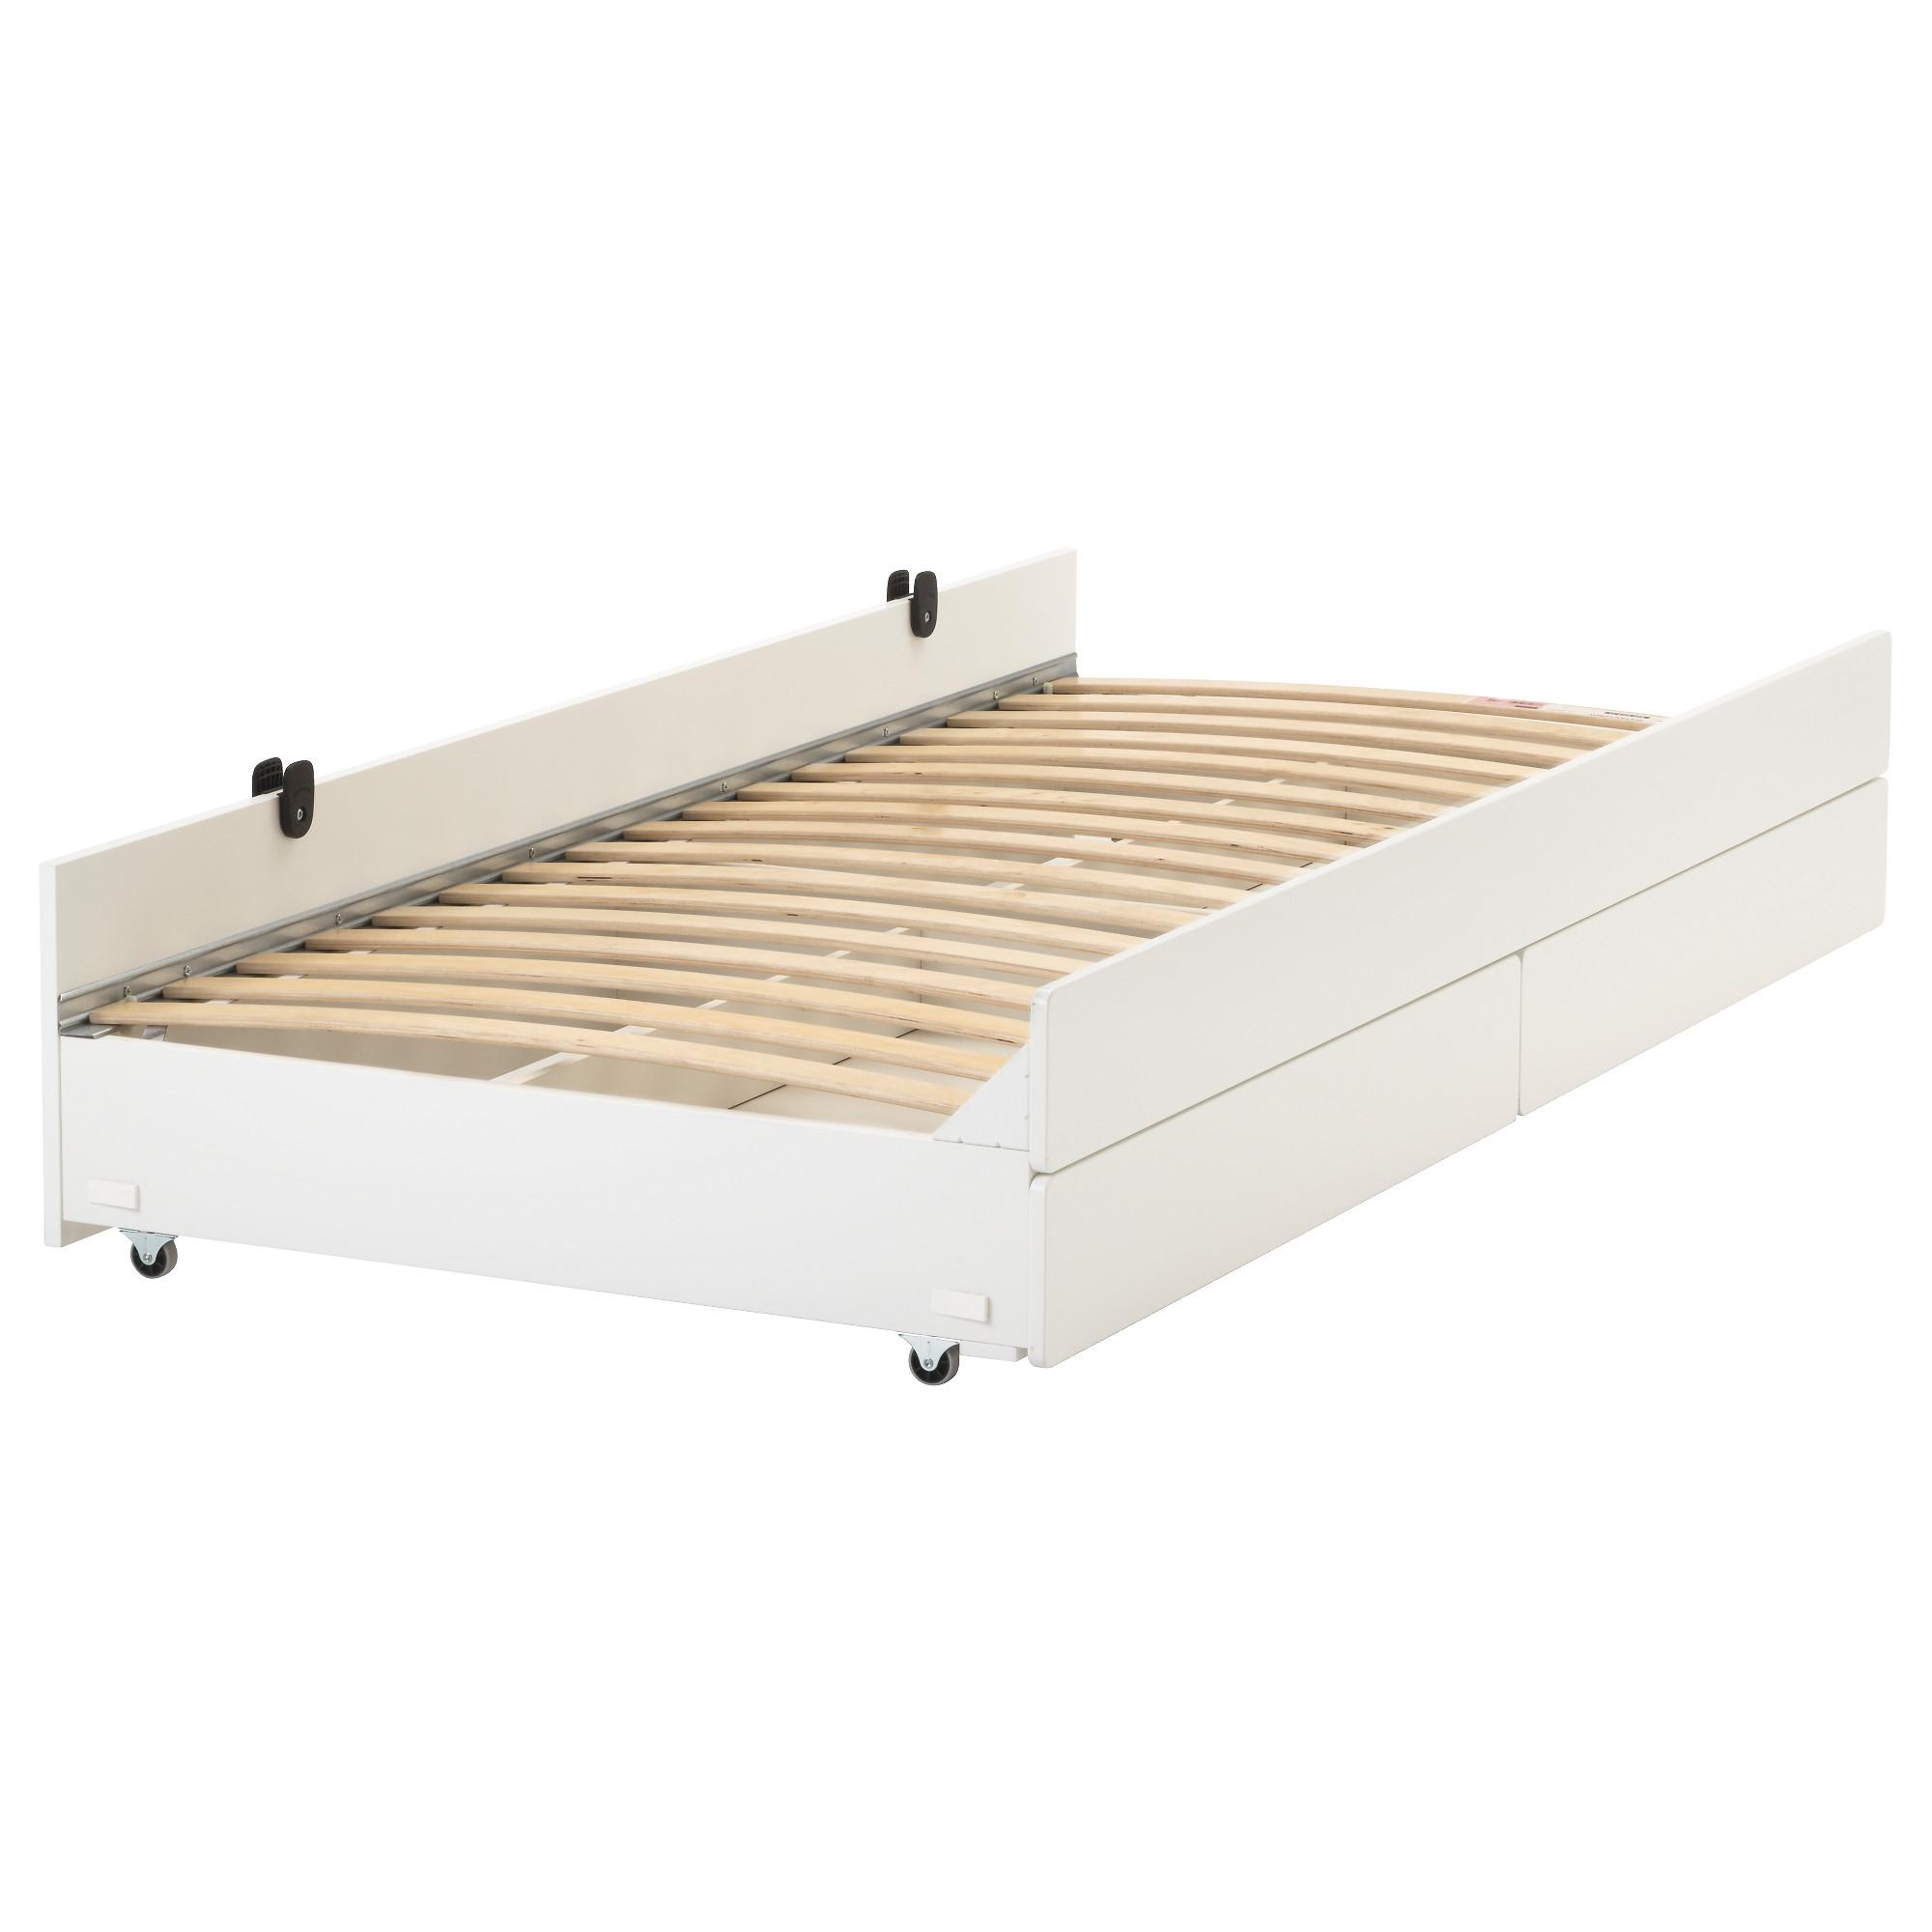 SLÄKT cama inferior con almacenaje + somier LURÖY